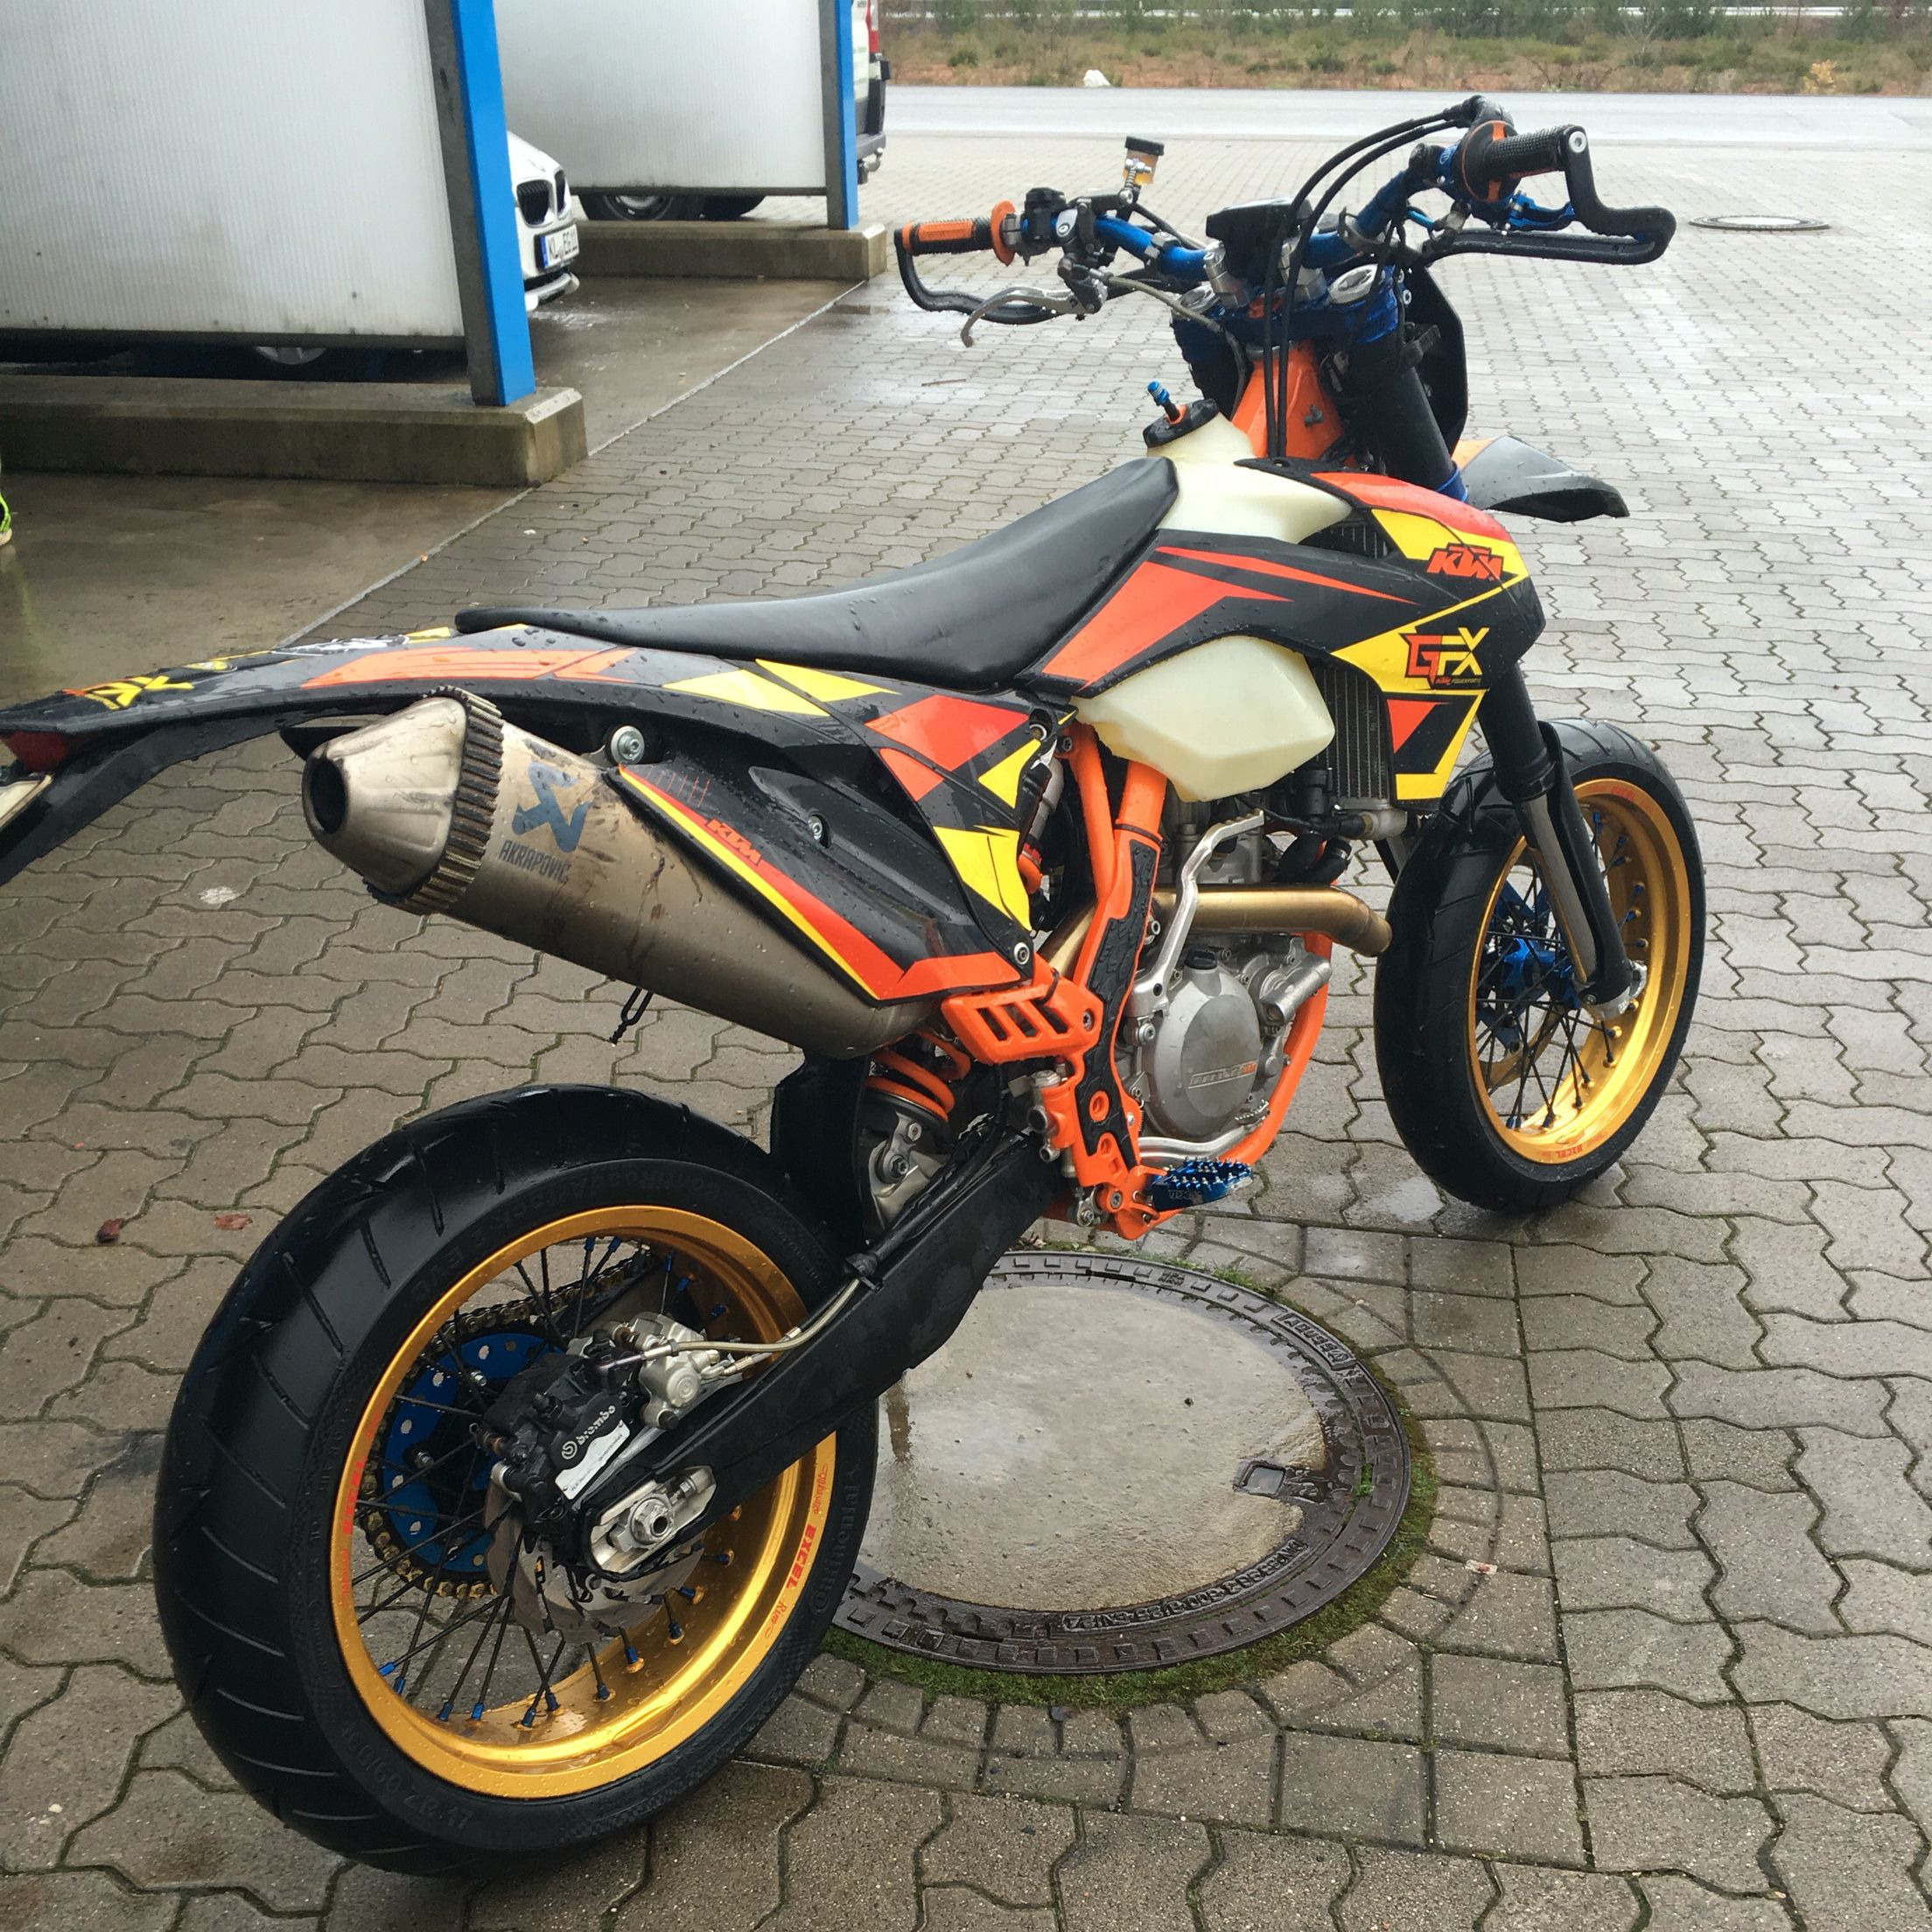 Supermoto ktm 690 stunt concept bikemotorcycletuned car tuning car - My Ktm Exc Supermoto Build